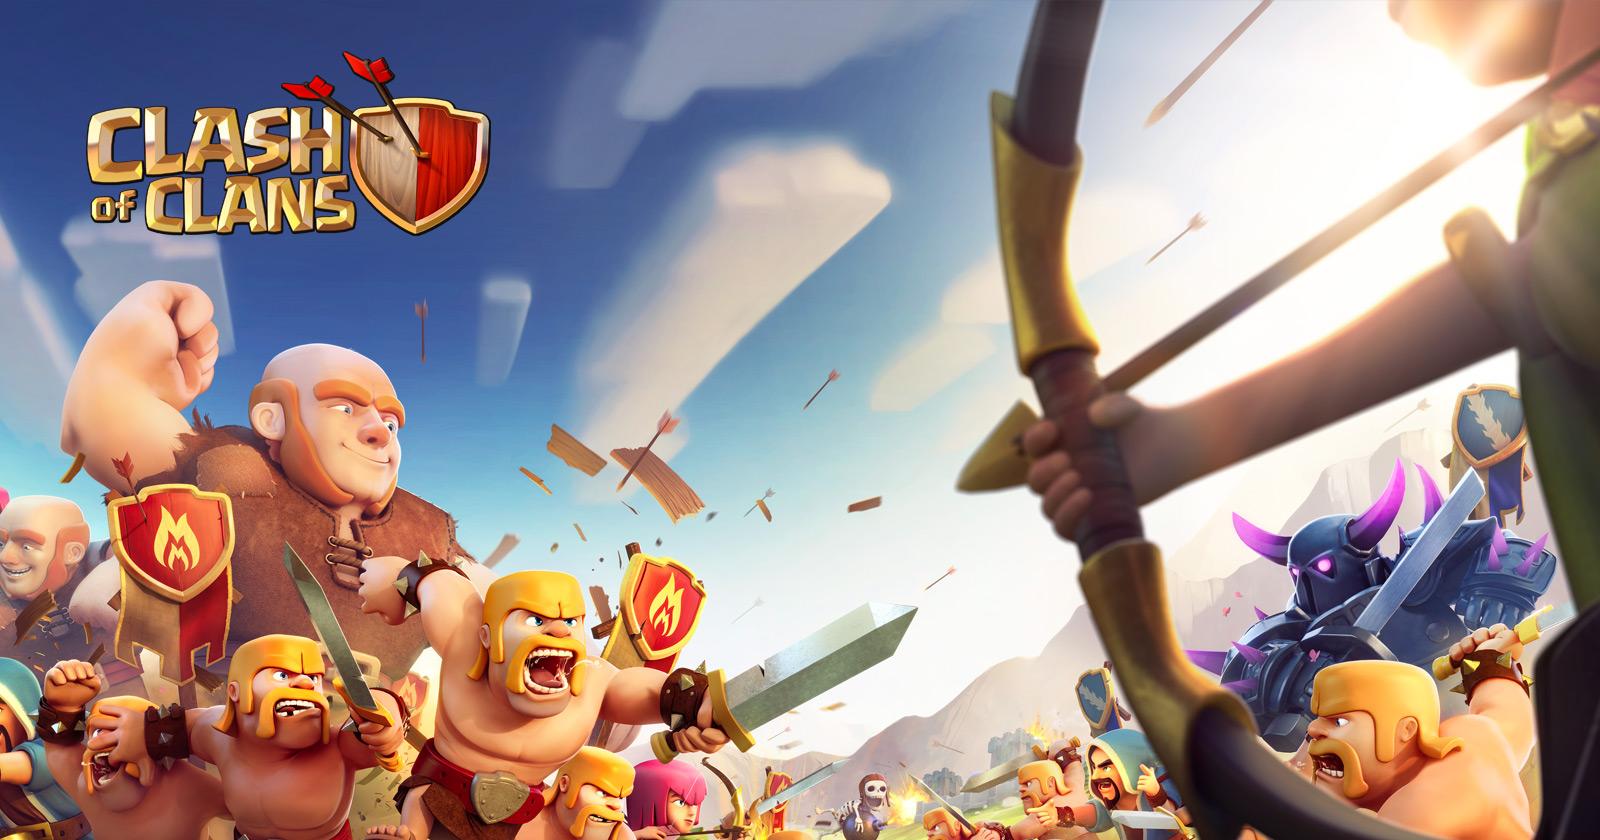 Clash of Clans April 2021 Update